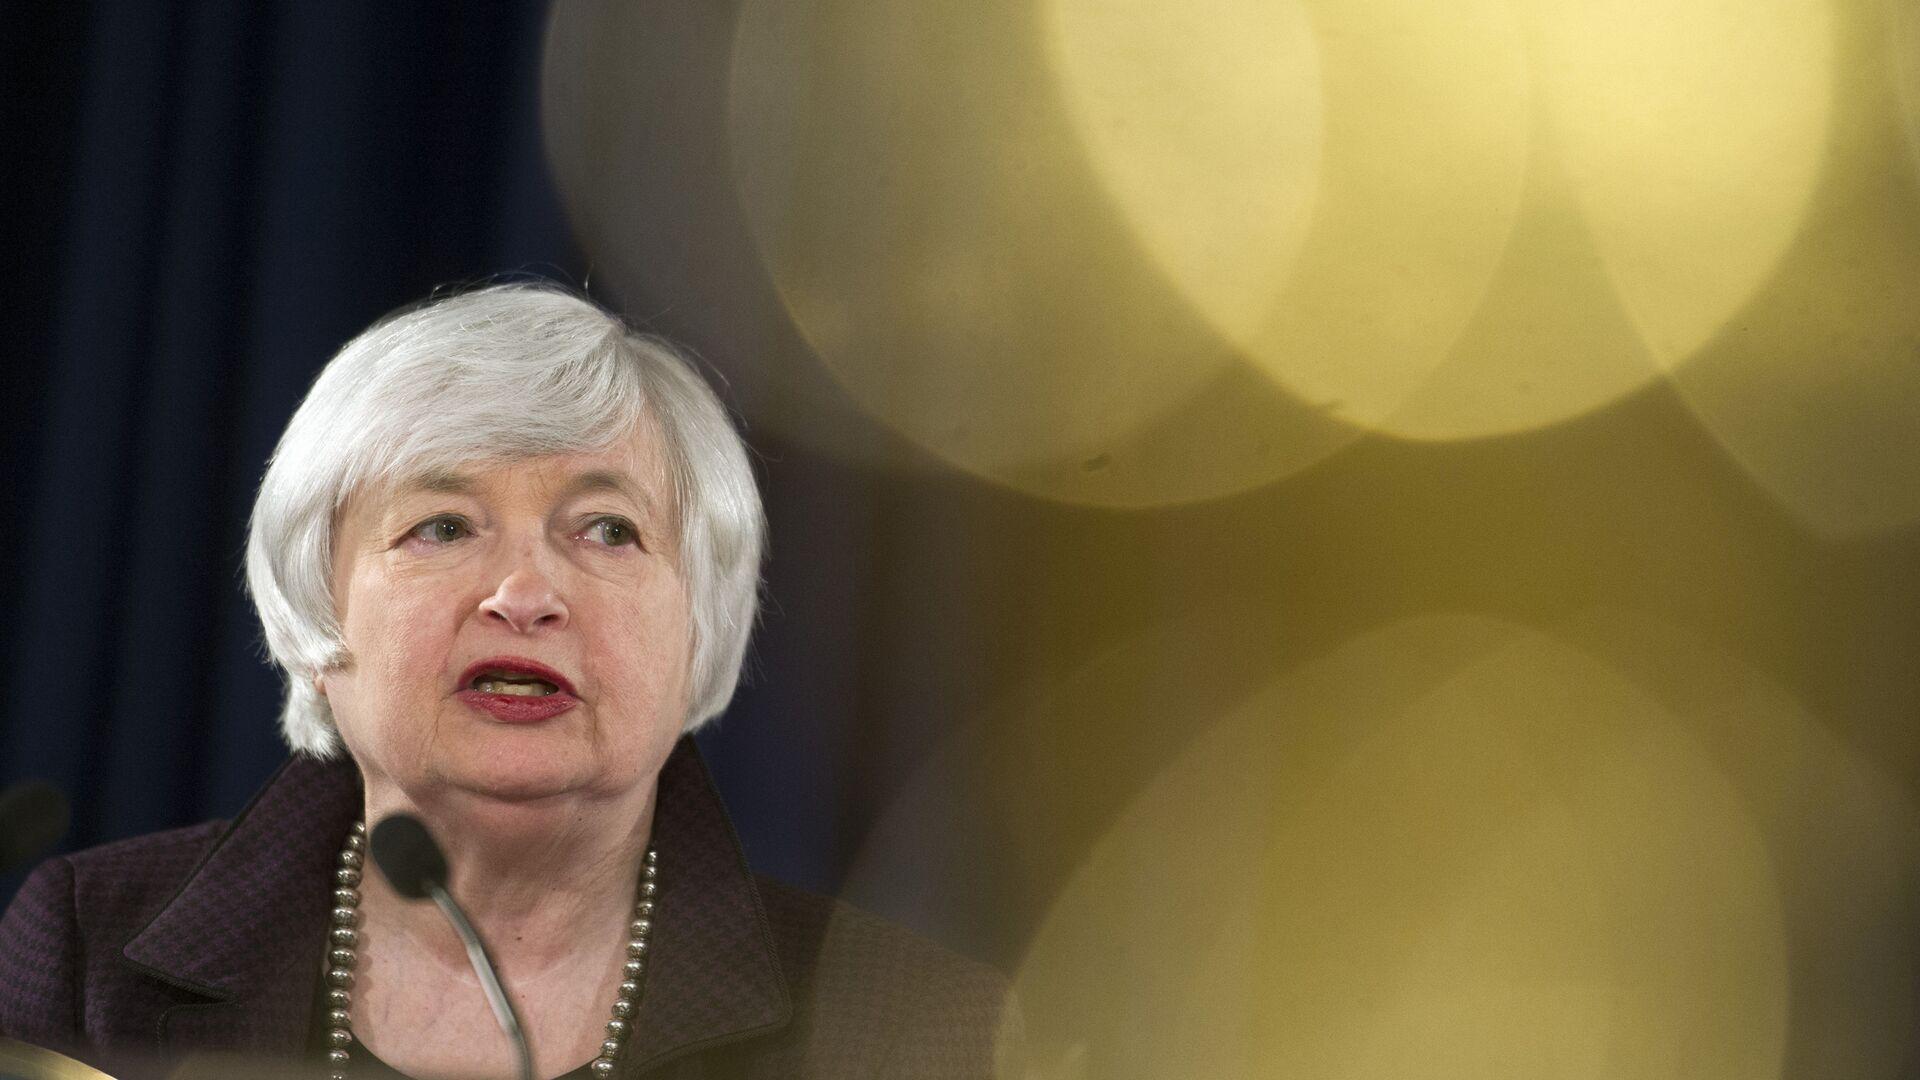 Глава ФРС США Джанет Йеллен в Вашингтоне  - Sputnik Mundo, 1920, 19.02.2021